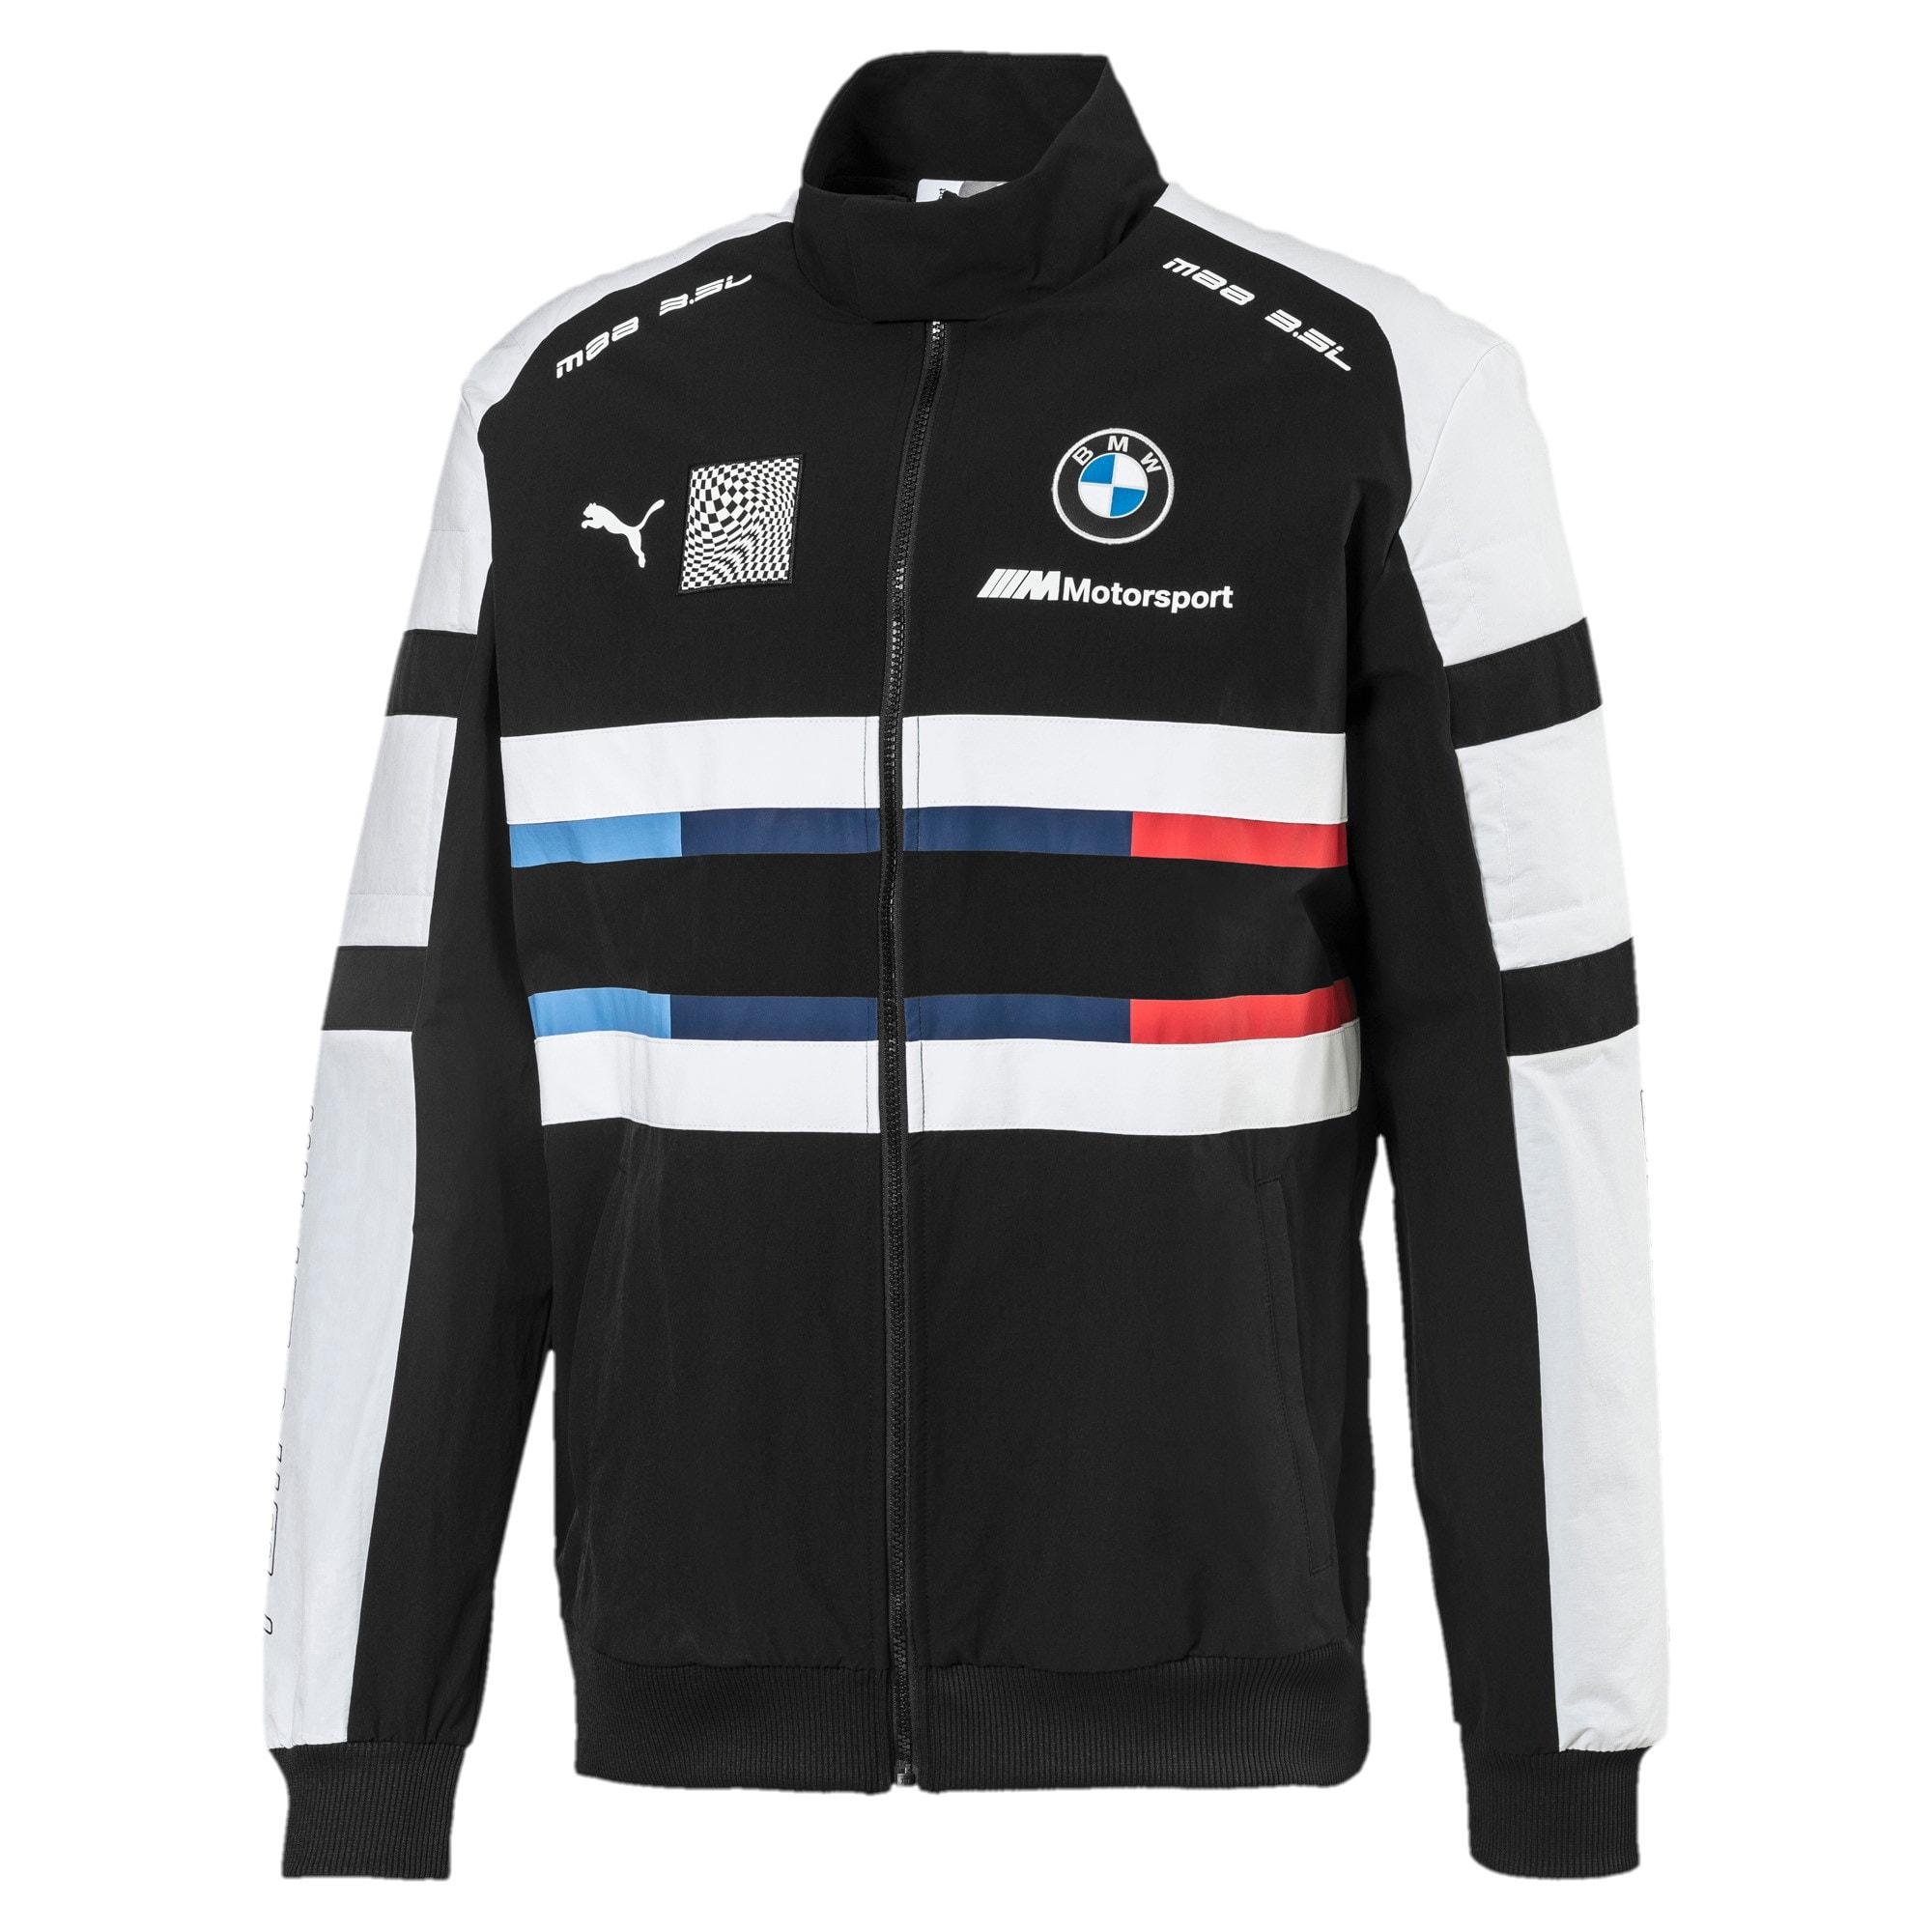 Thumbnail 4 of BMW Motorsport Street Woven Men's Jacket, Puma Black, medium